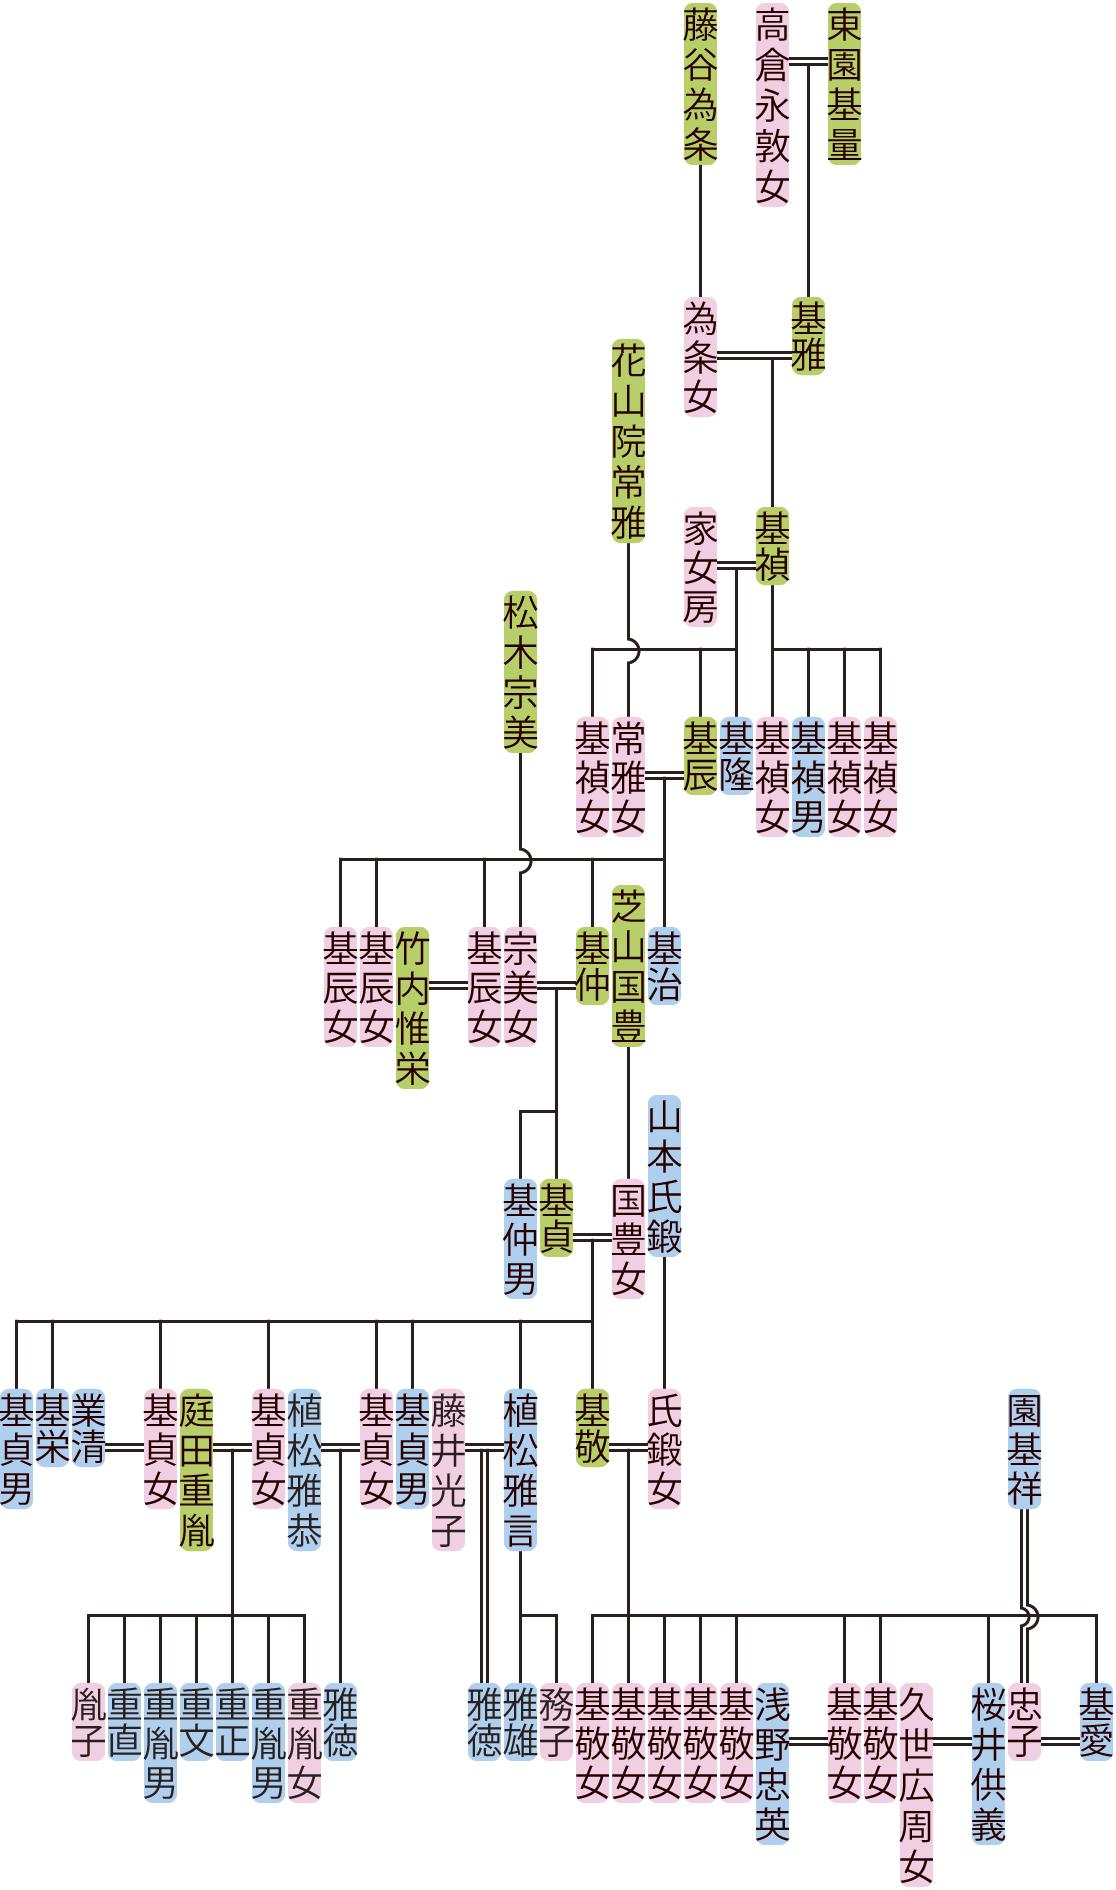 東園基禎~基愛の系図